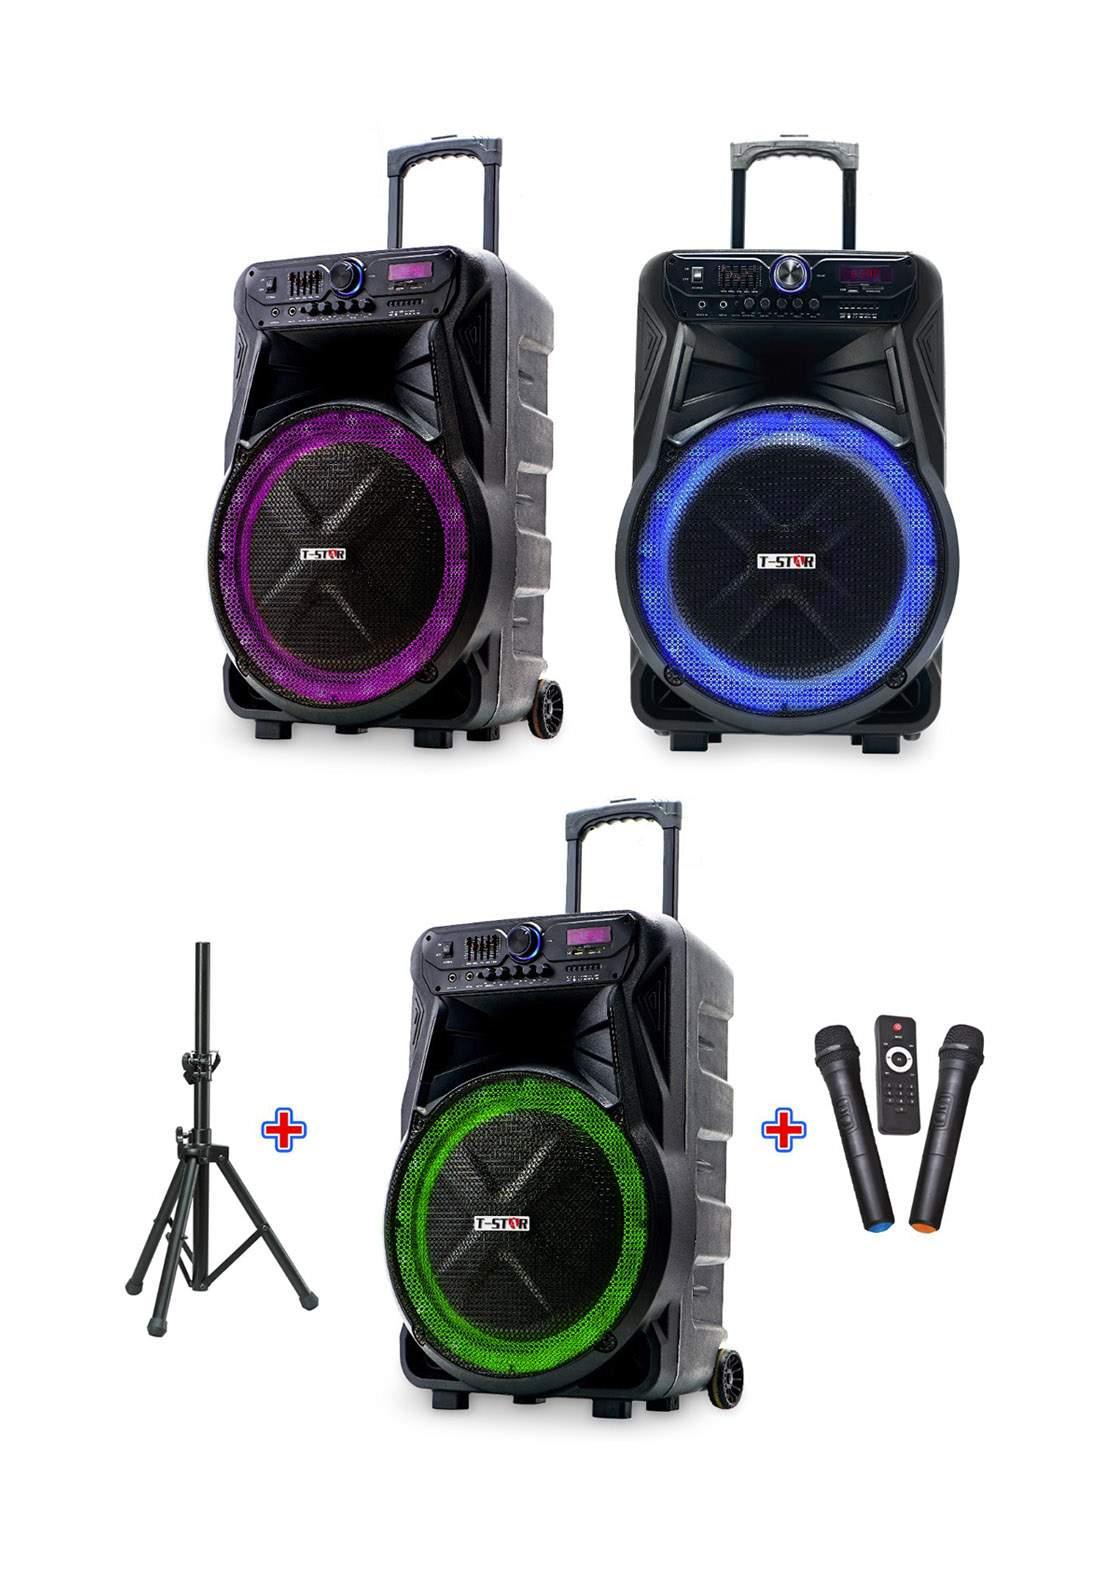 FM USB USB Wireless Speaker (T-2919A) سبيكر